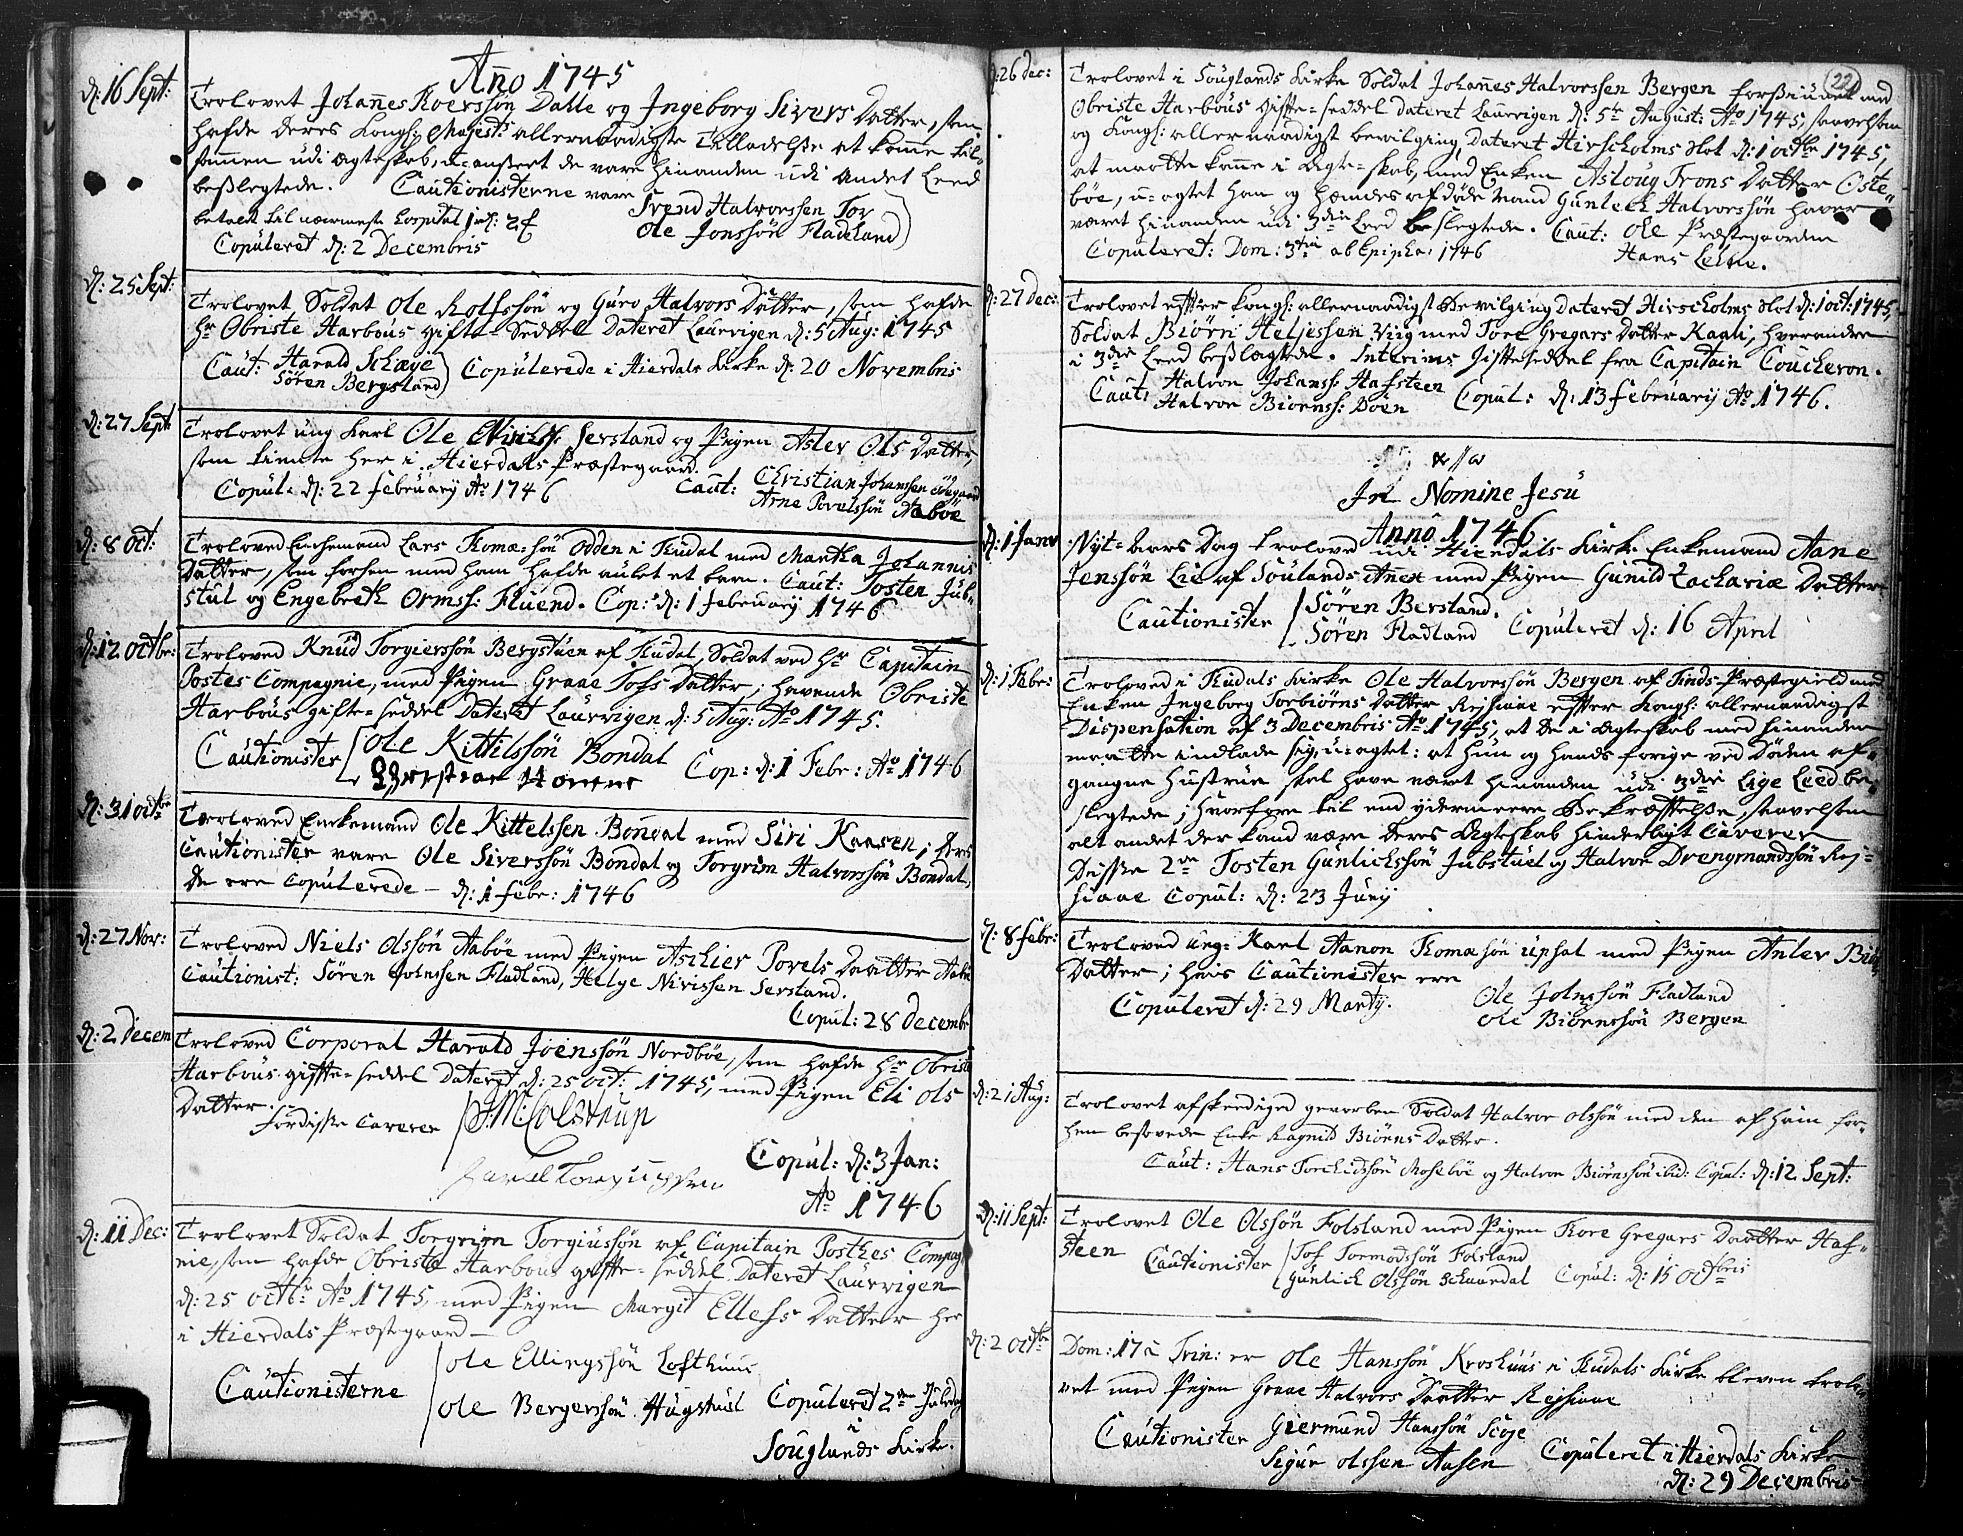 SAKO, Hjartdal kirkebøker, F/Fa/L0004: Ministerialbok nr. I 4, 1727-1795, s. 22